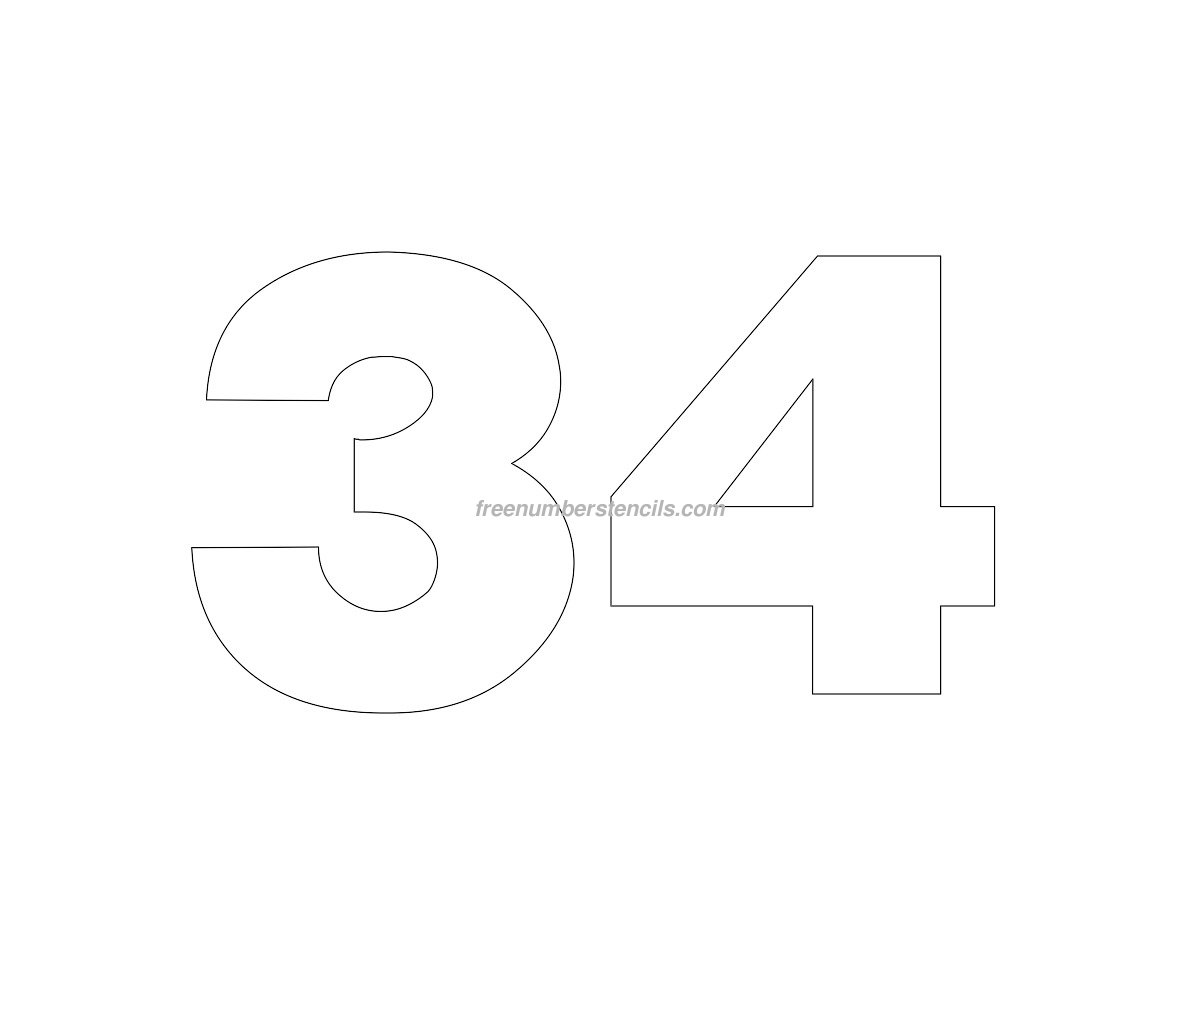 Free Helvetica 34 Number Stencil Freenumberstencils Com